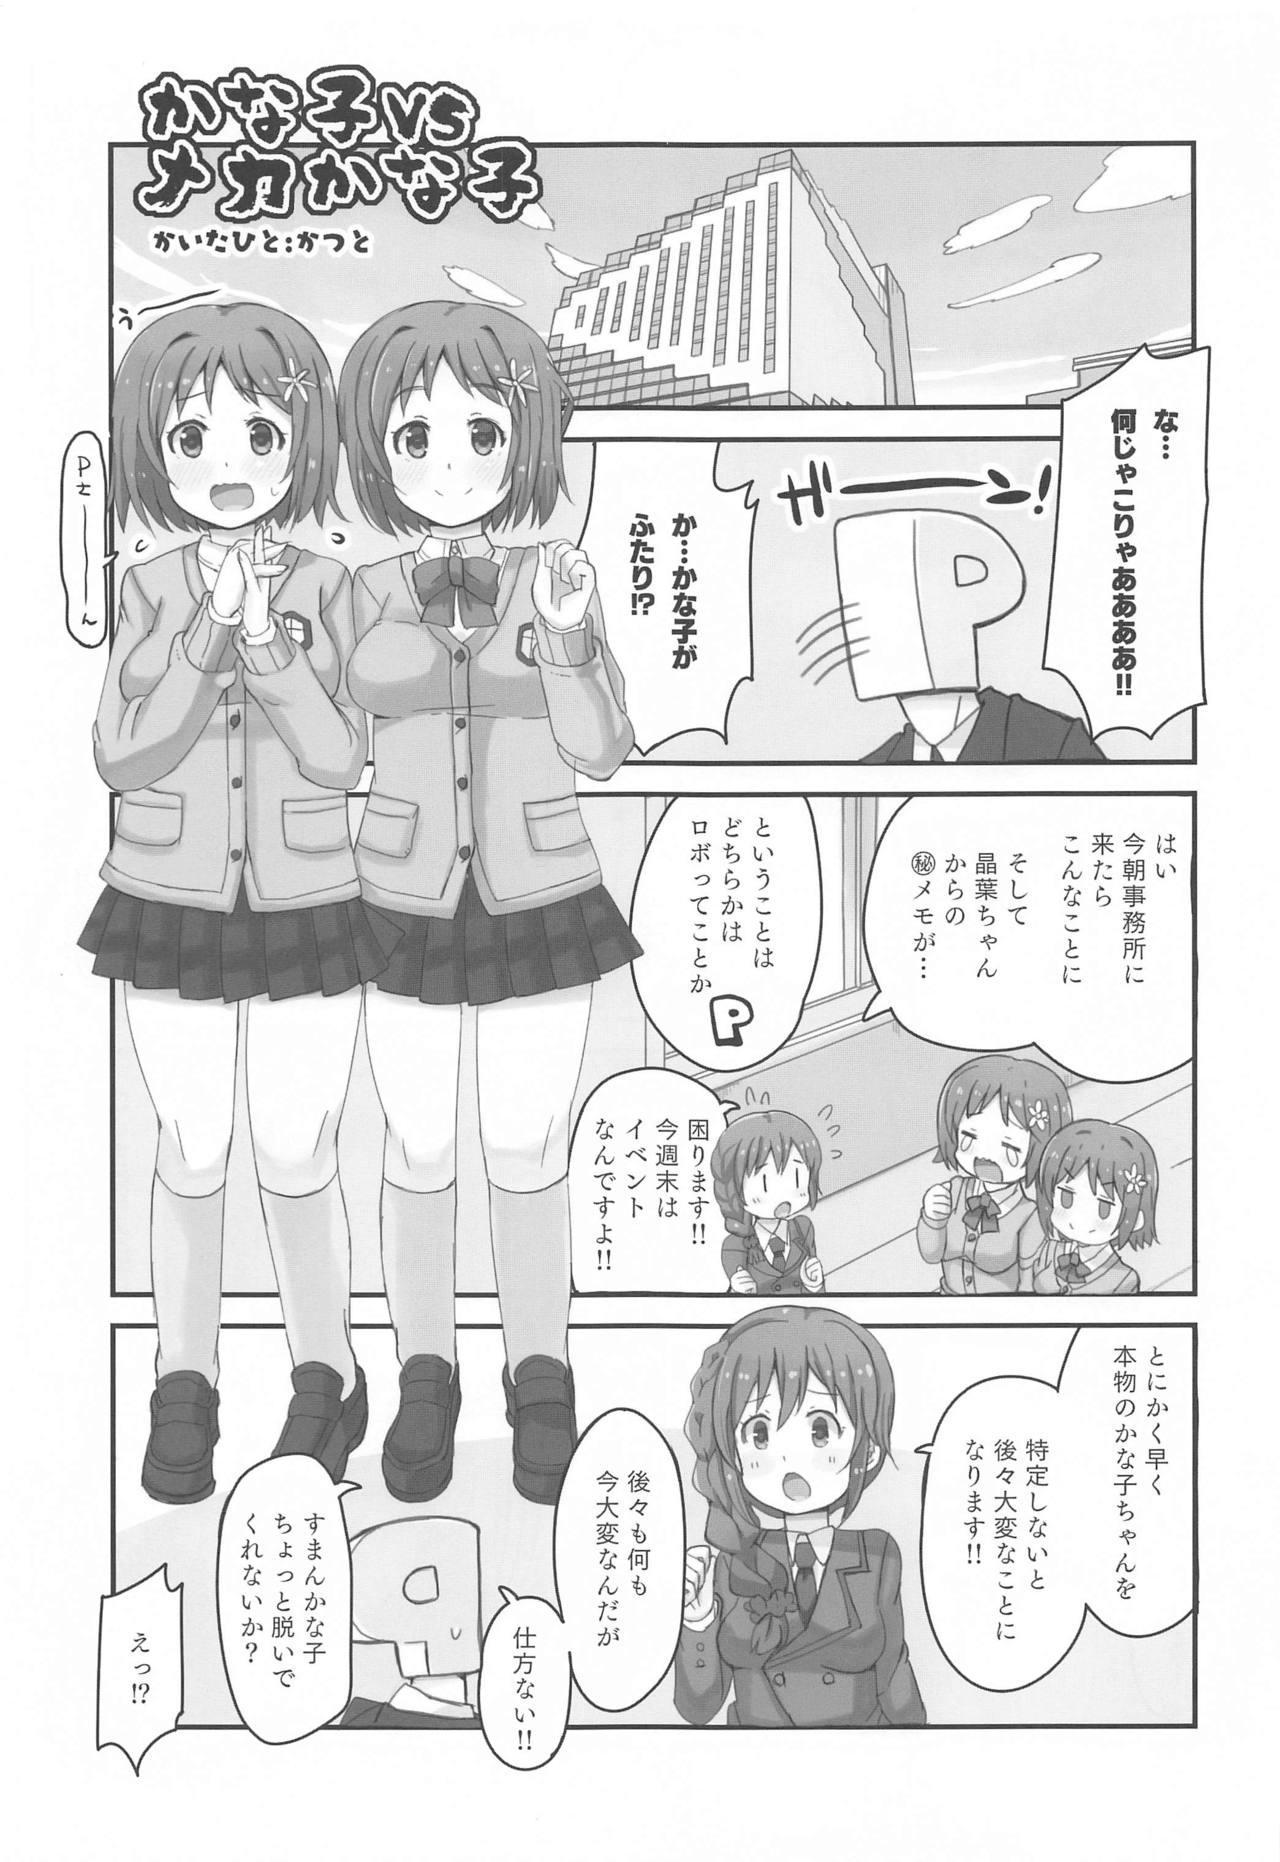 Kanako vs Meka Kanako 3